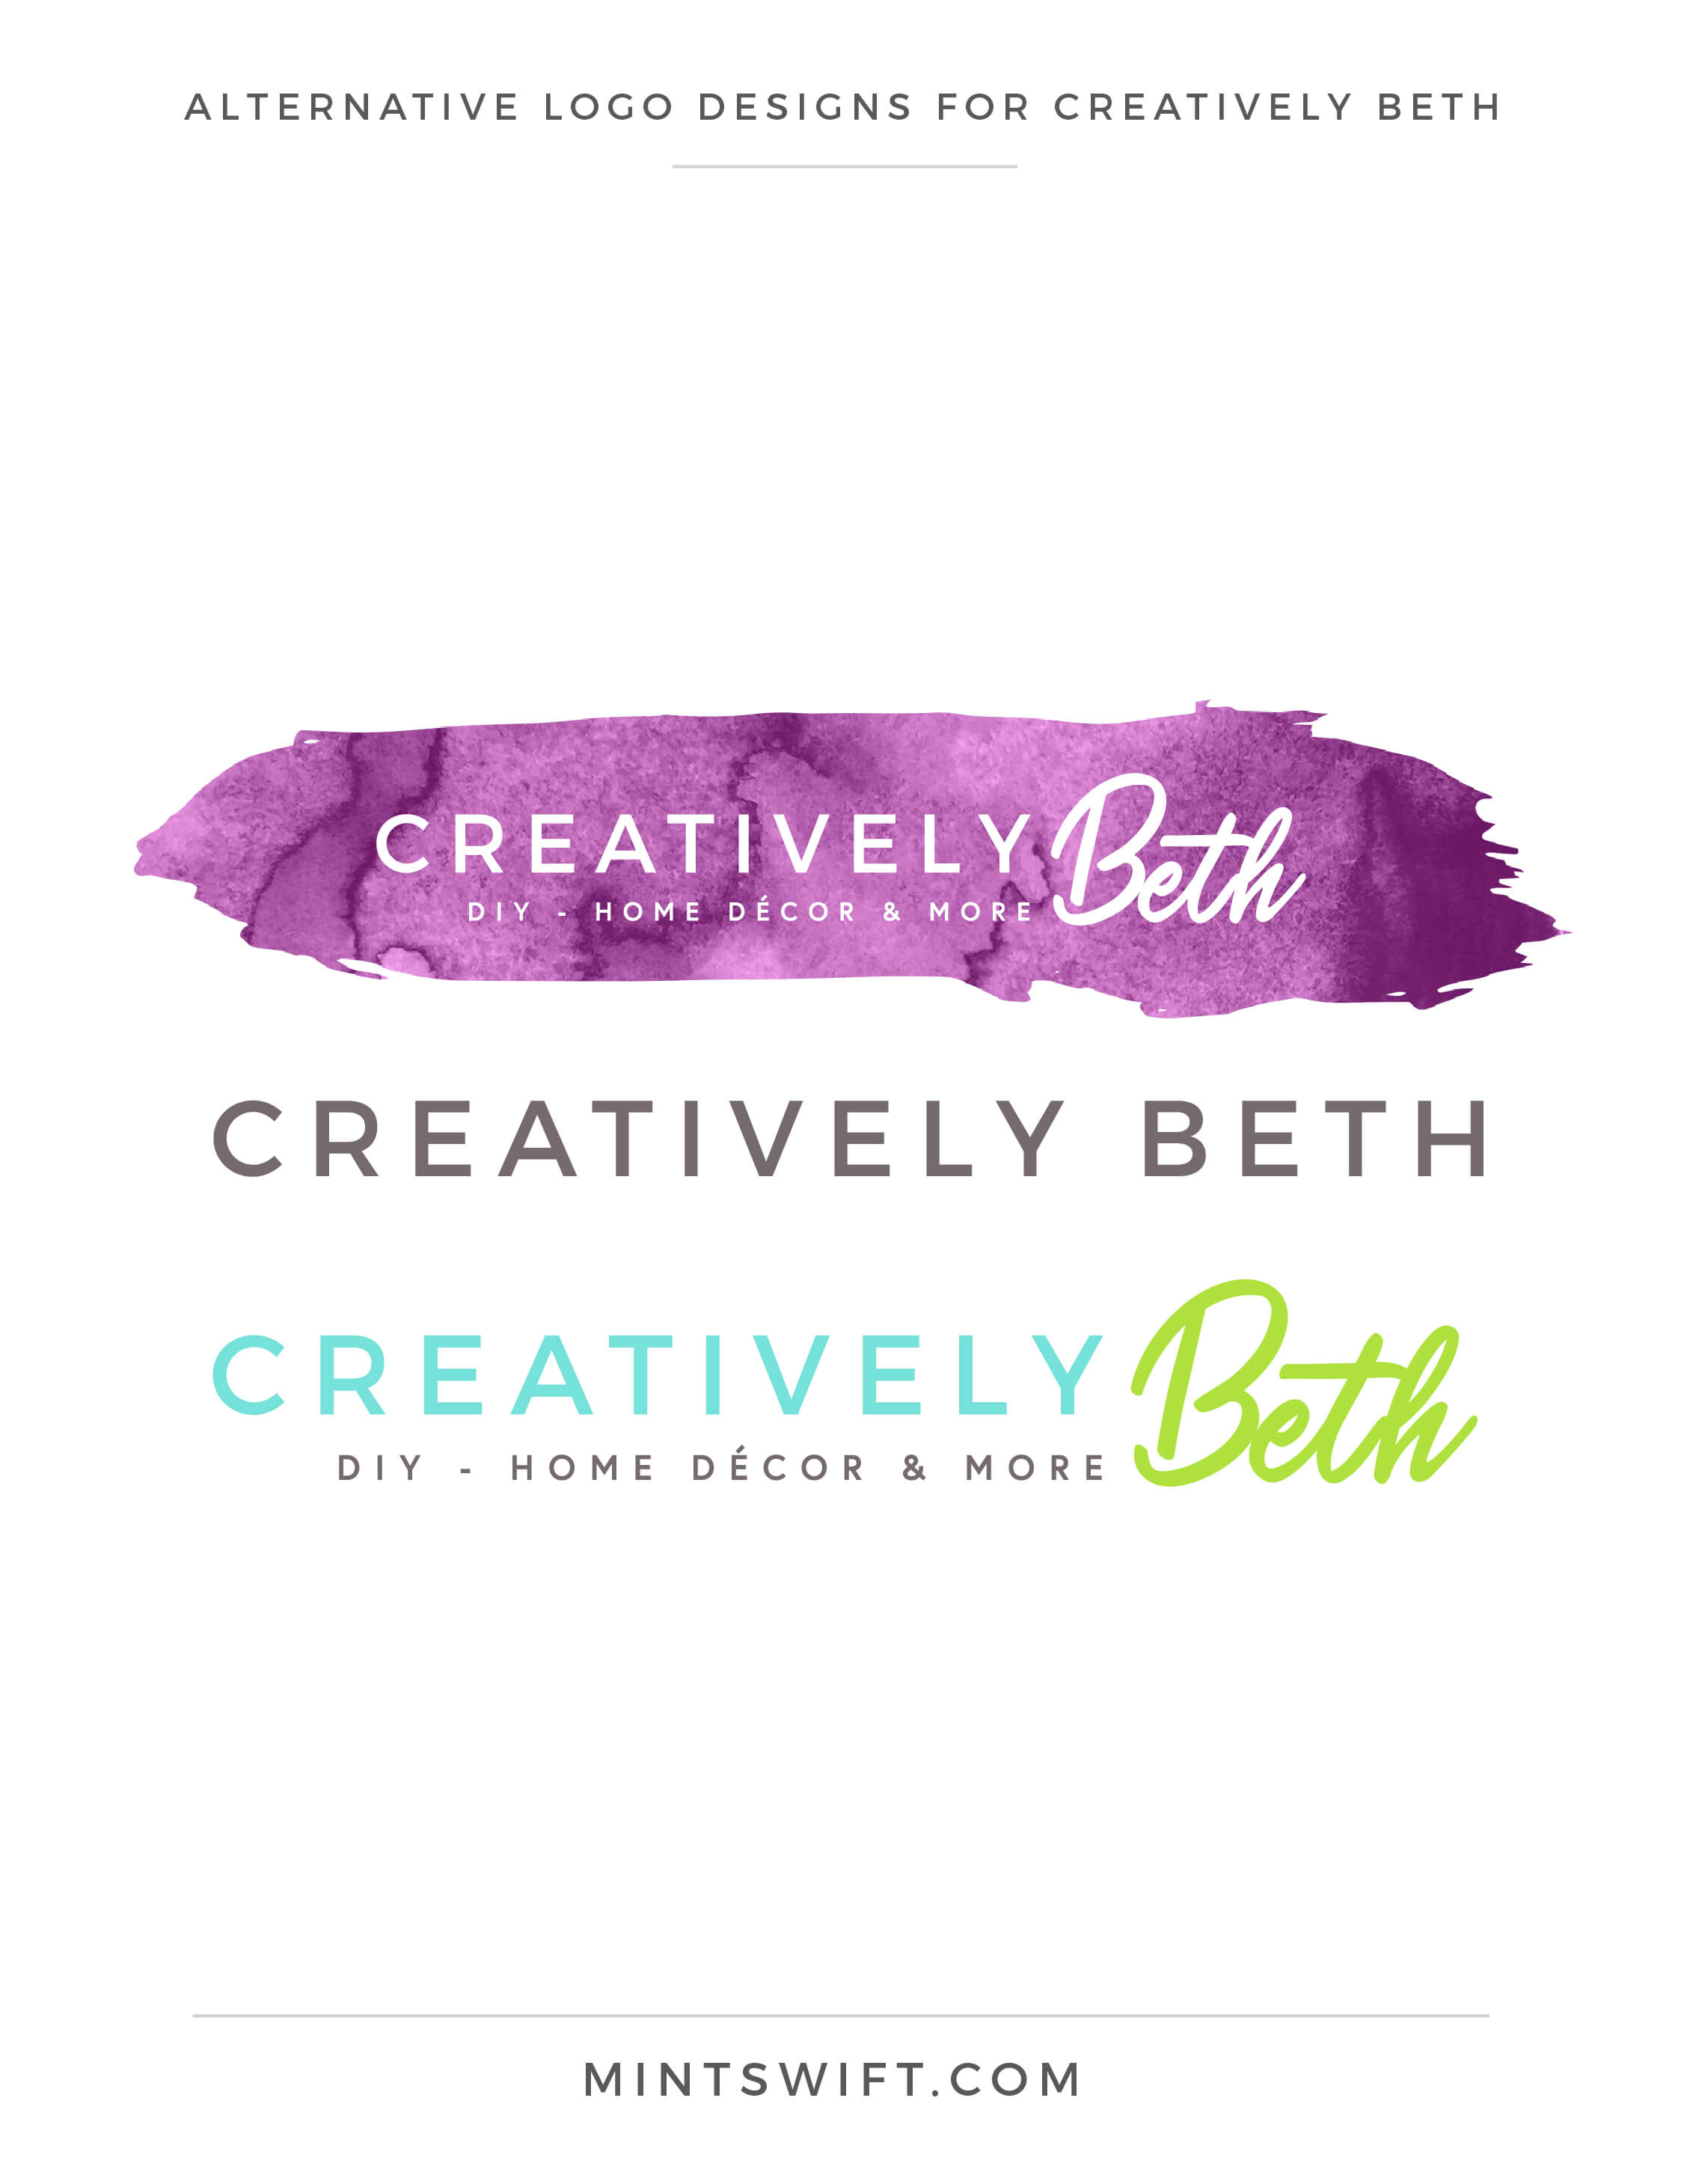 Creatively Beth - Alternative Logo Designs - Brand & Website Design - MintSwift